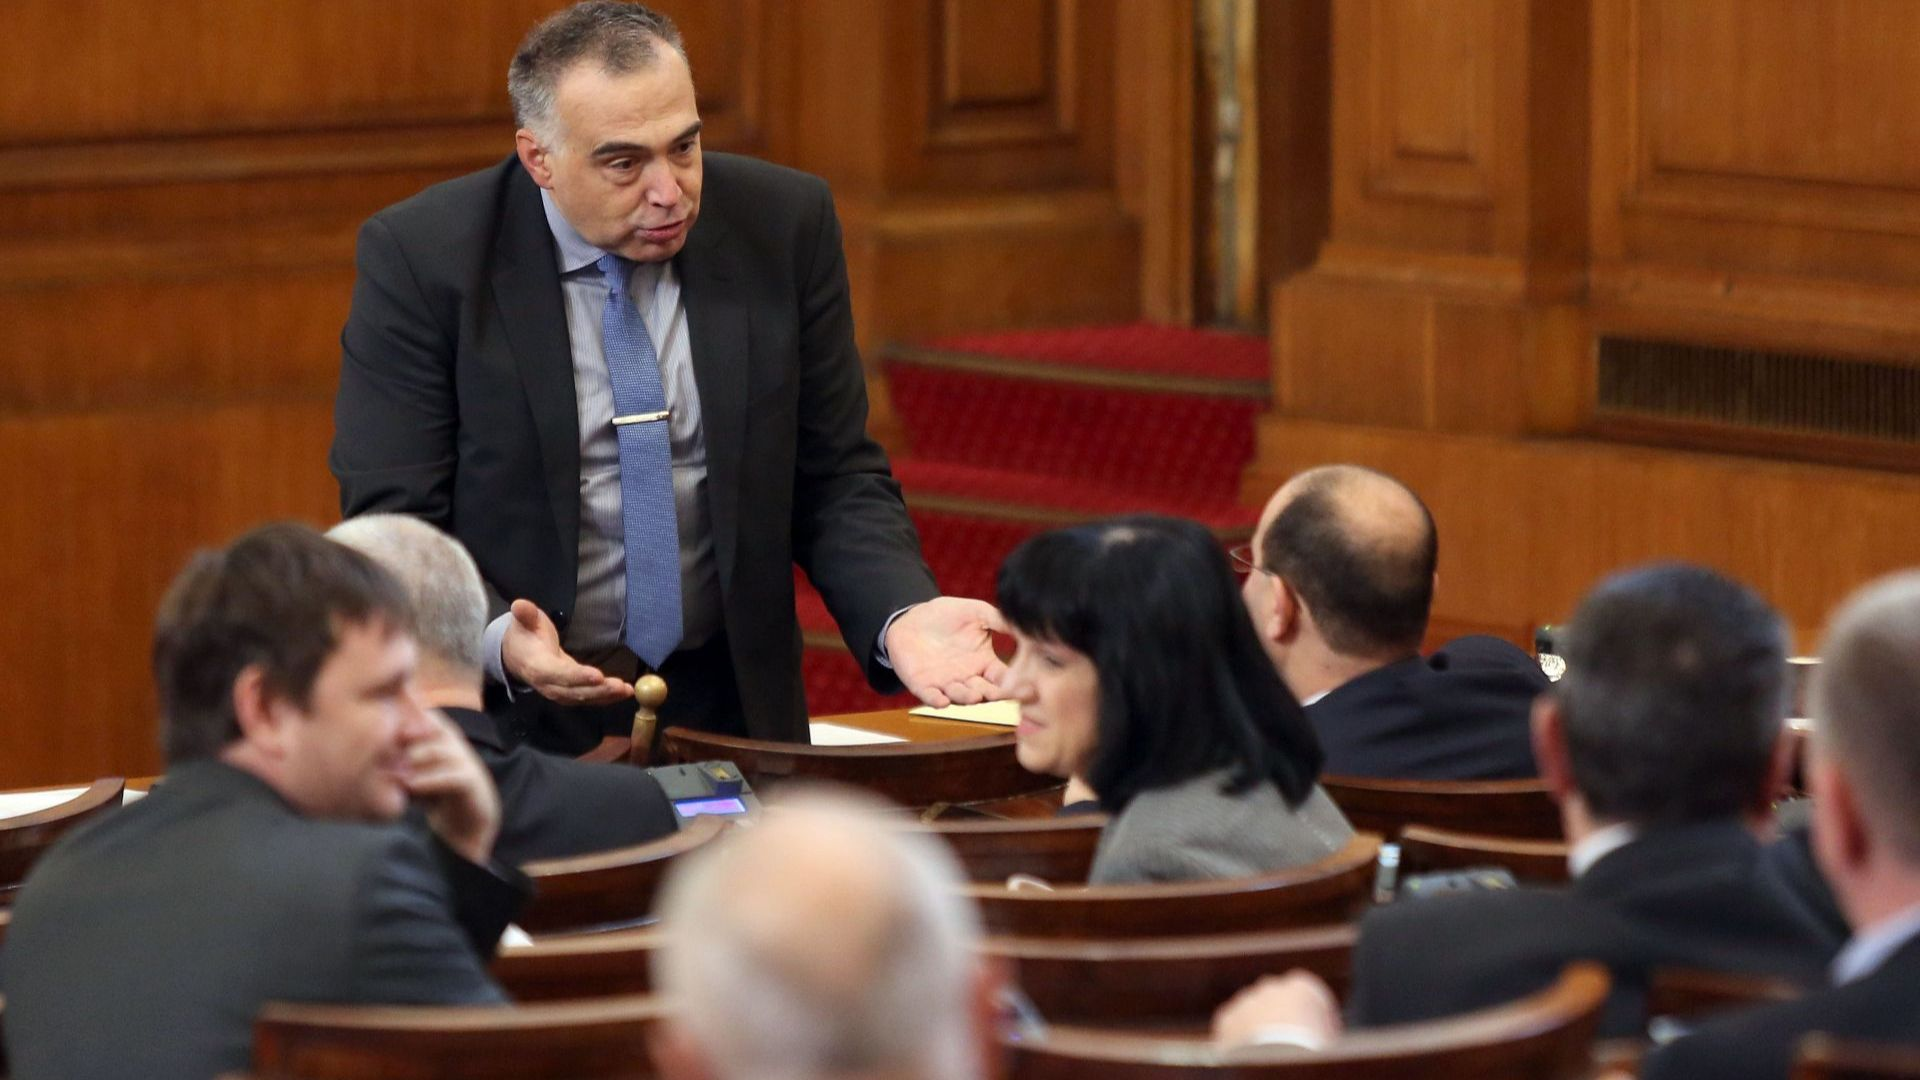 Кутев: При разкапан ГЕРБ и протести, БСП има една цел - 1 млн. гласа на изборите